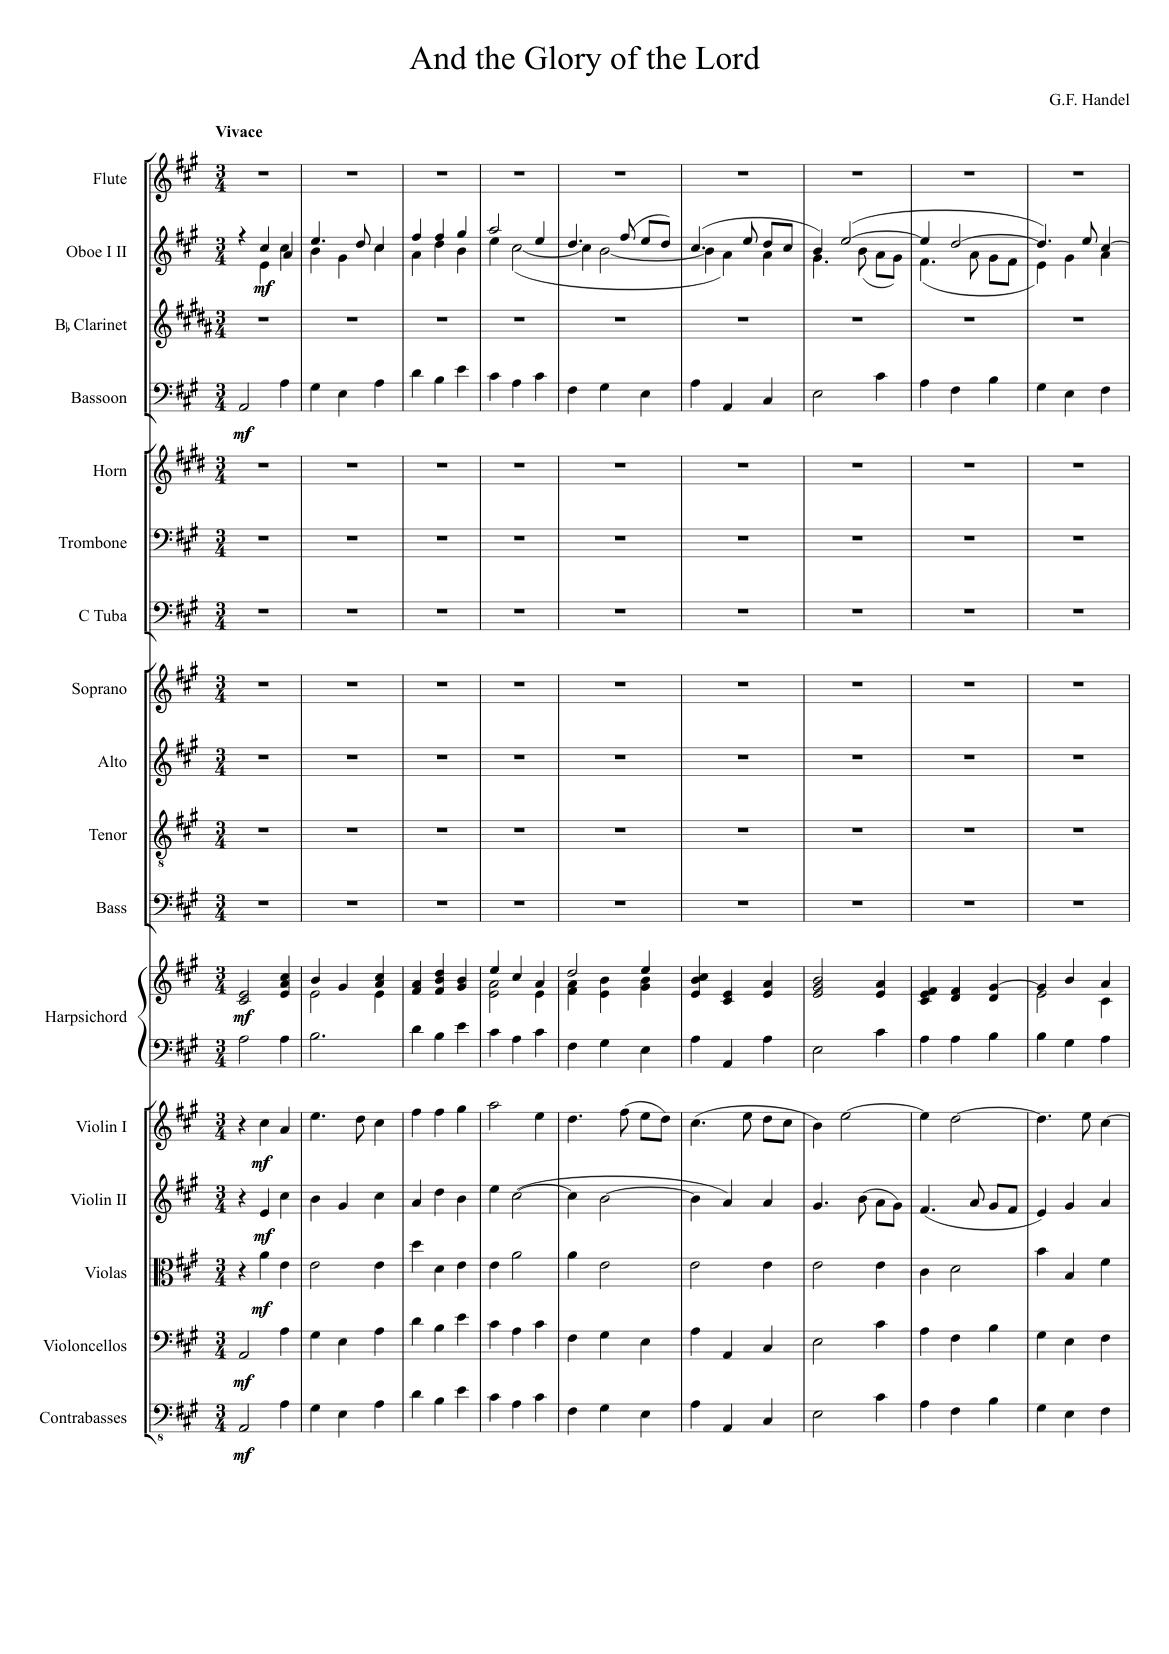 Orchestral suite no. 2 2. Rondeau download sheet music pdf file.